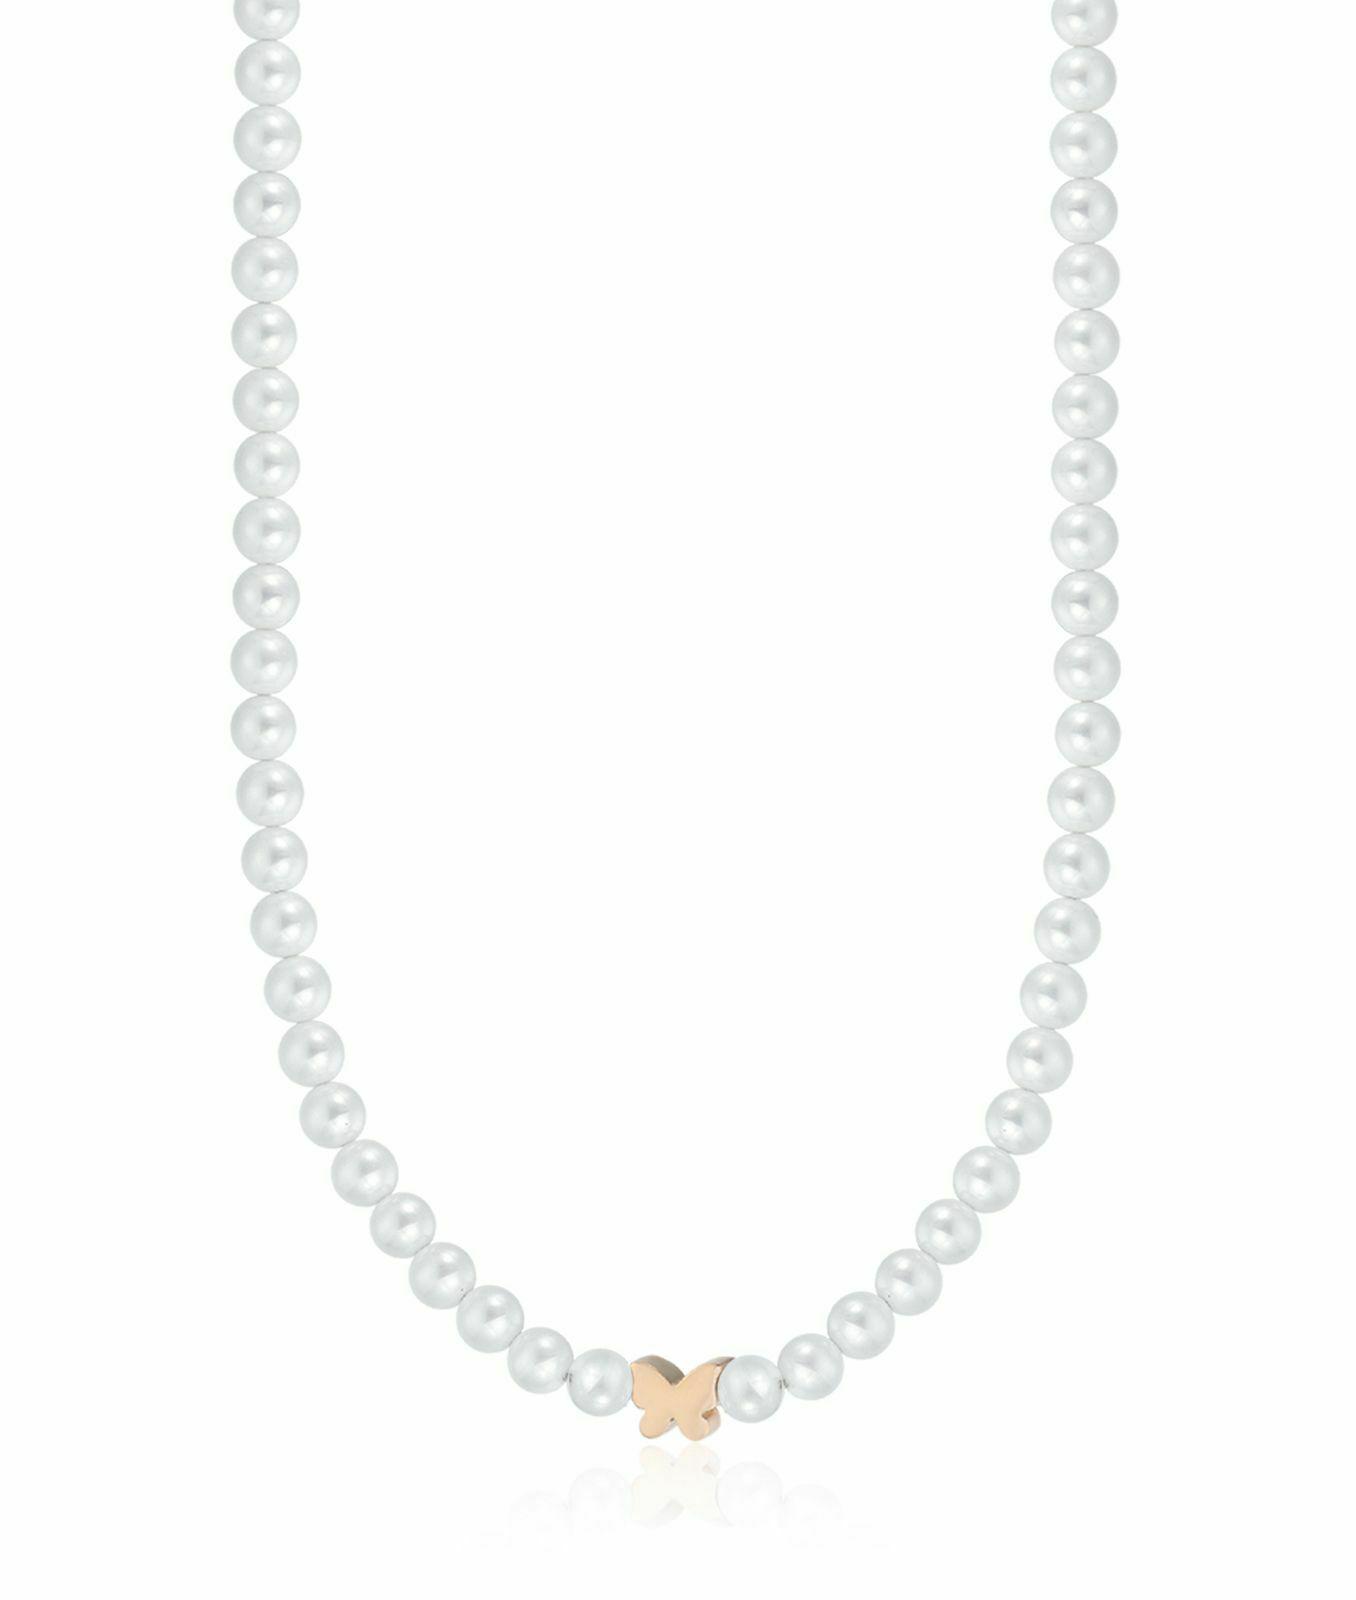 Collana donna in acciaio con perle e farfalla rosè Luca Barra CK1395